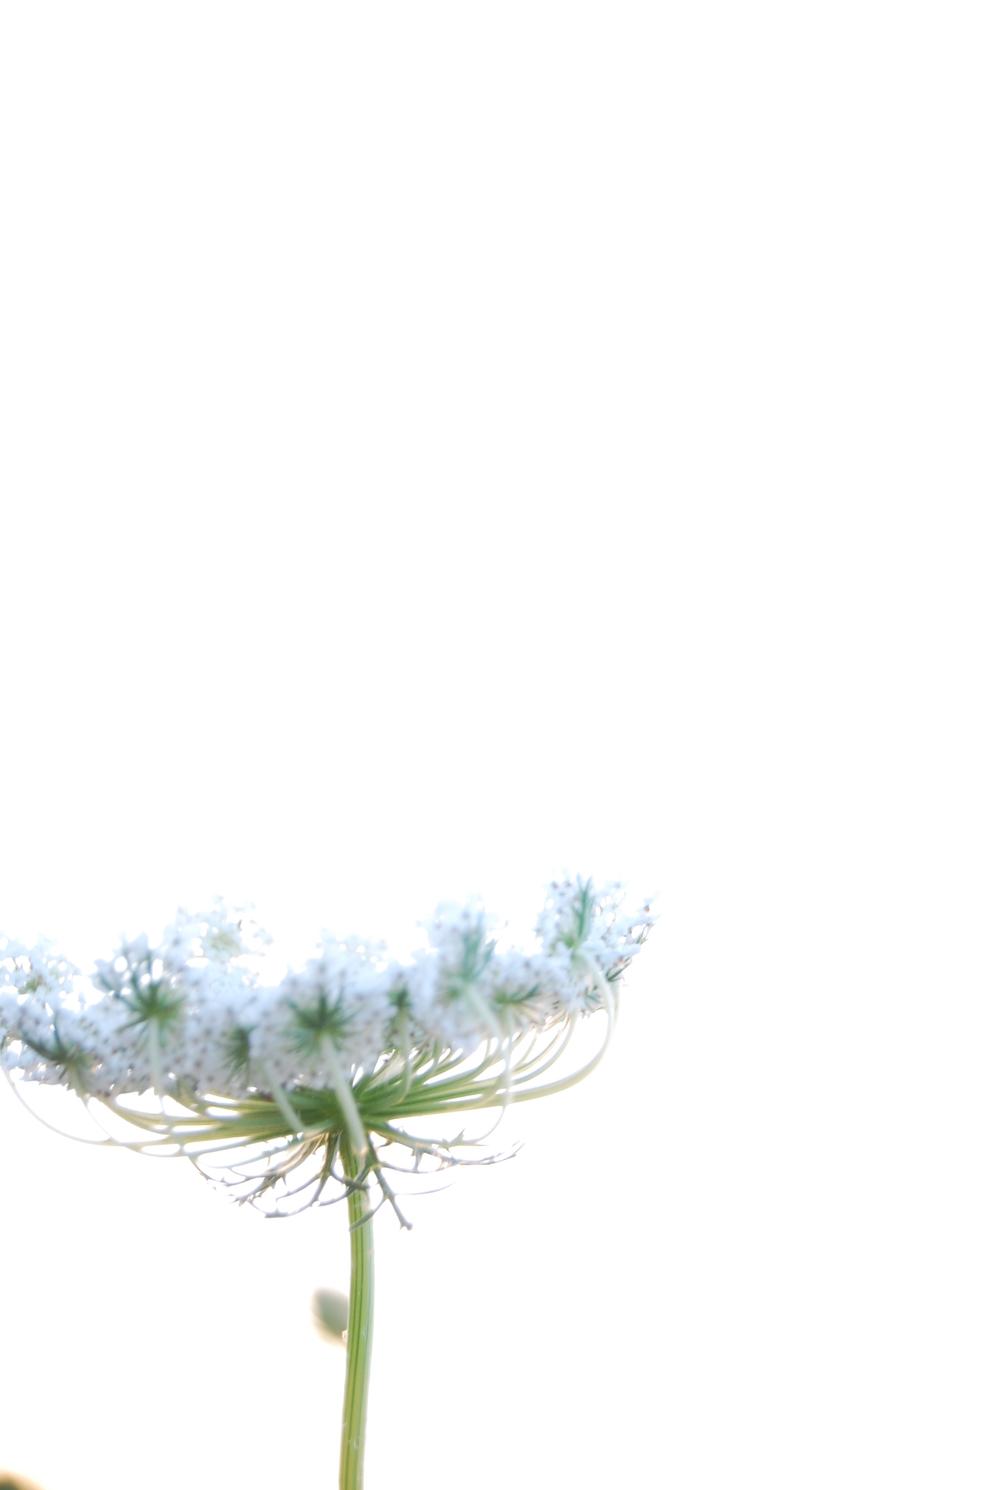 Lace flowers magic hour 156.JPG